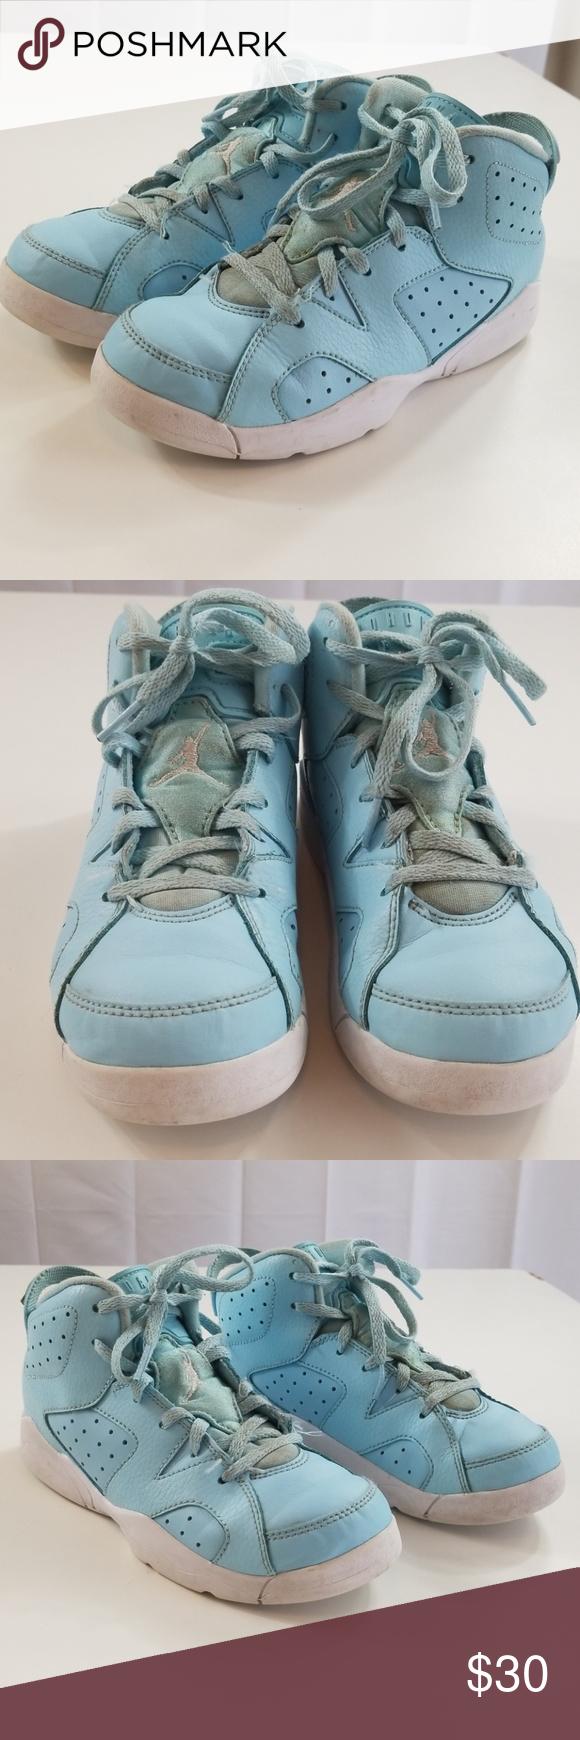 fda1596b21e328 Nike Air Jordan 6 Retro GG VI Pantone Shoes A4 Sku 543390 407 Girls Youth  size